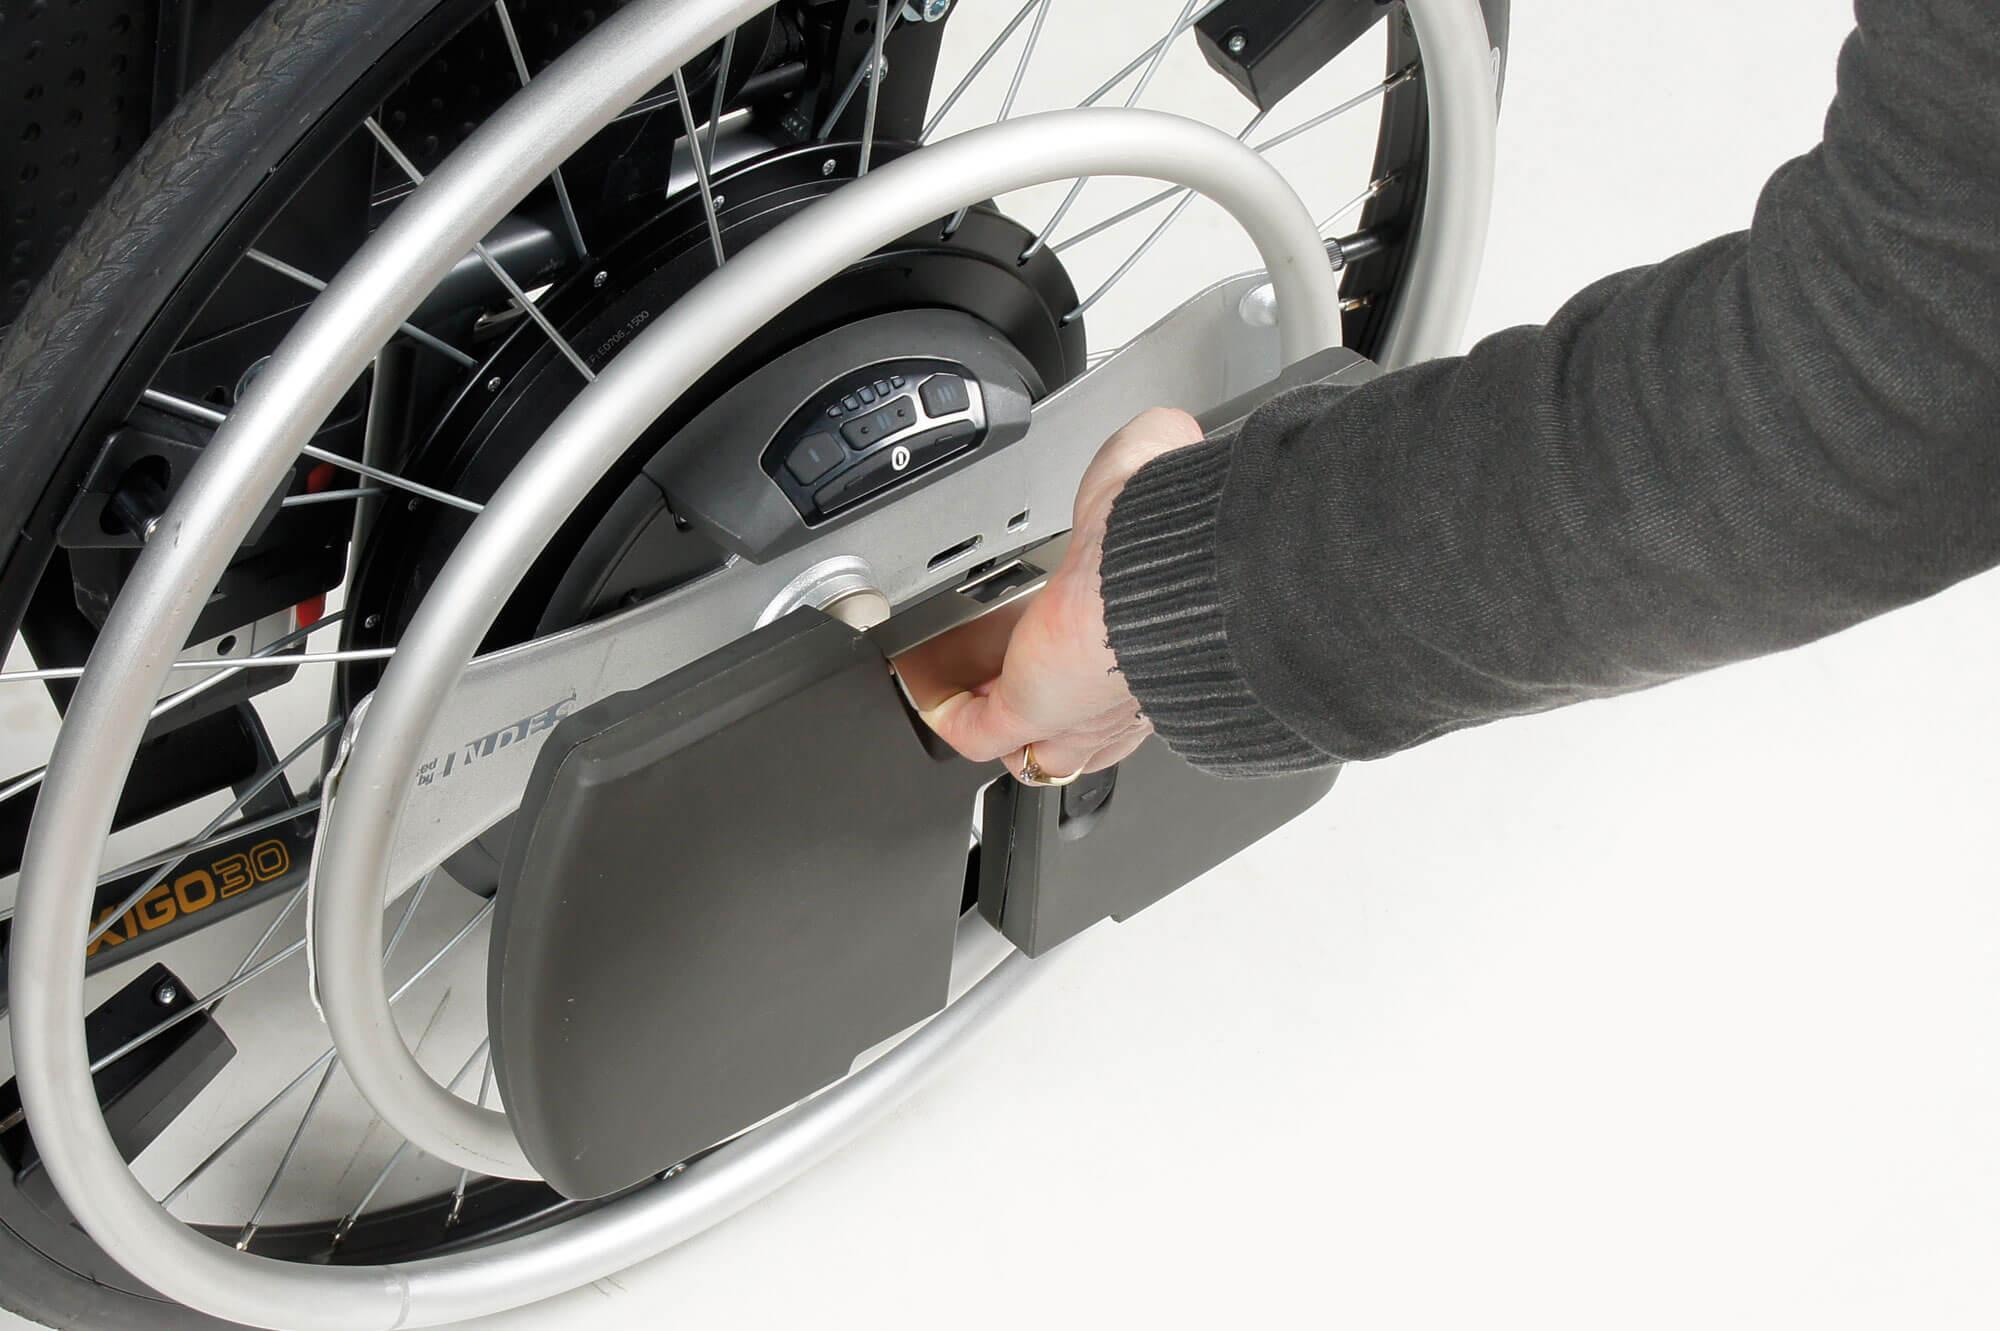 AYUDAS Eléctricas para tú SILLA DE RUEDAS MANUAL WheelDrive